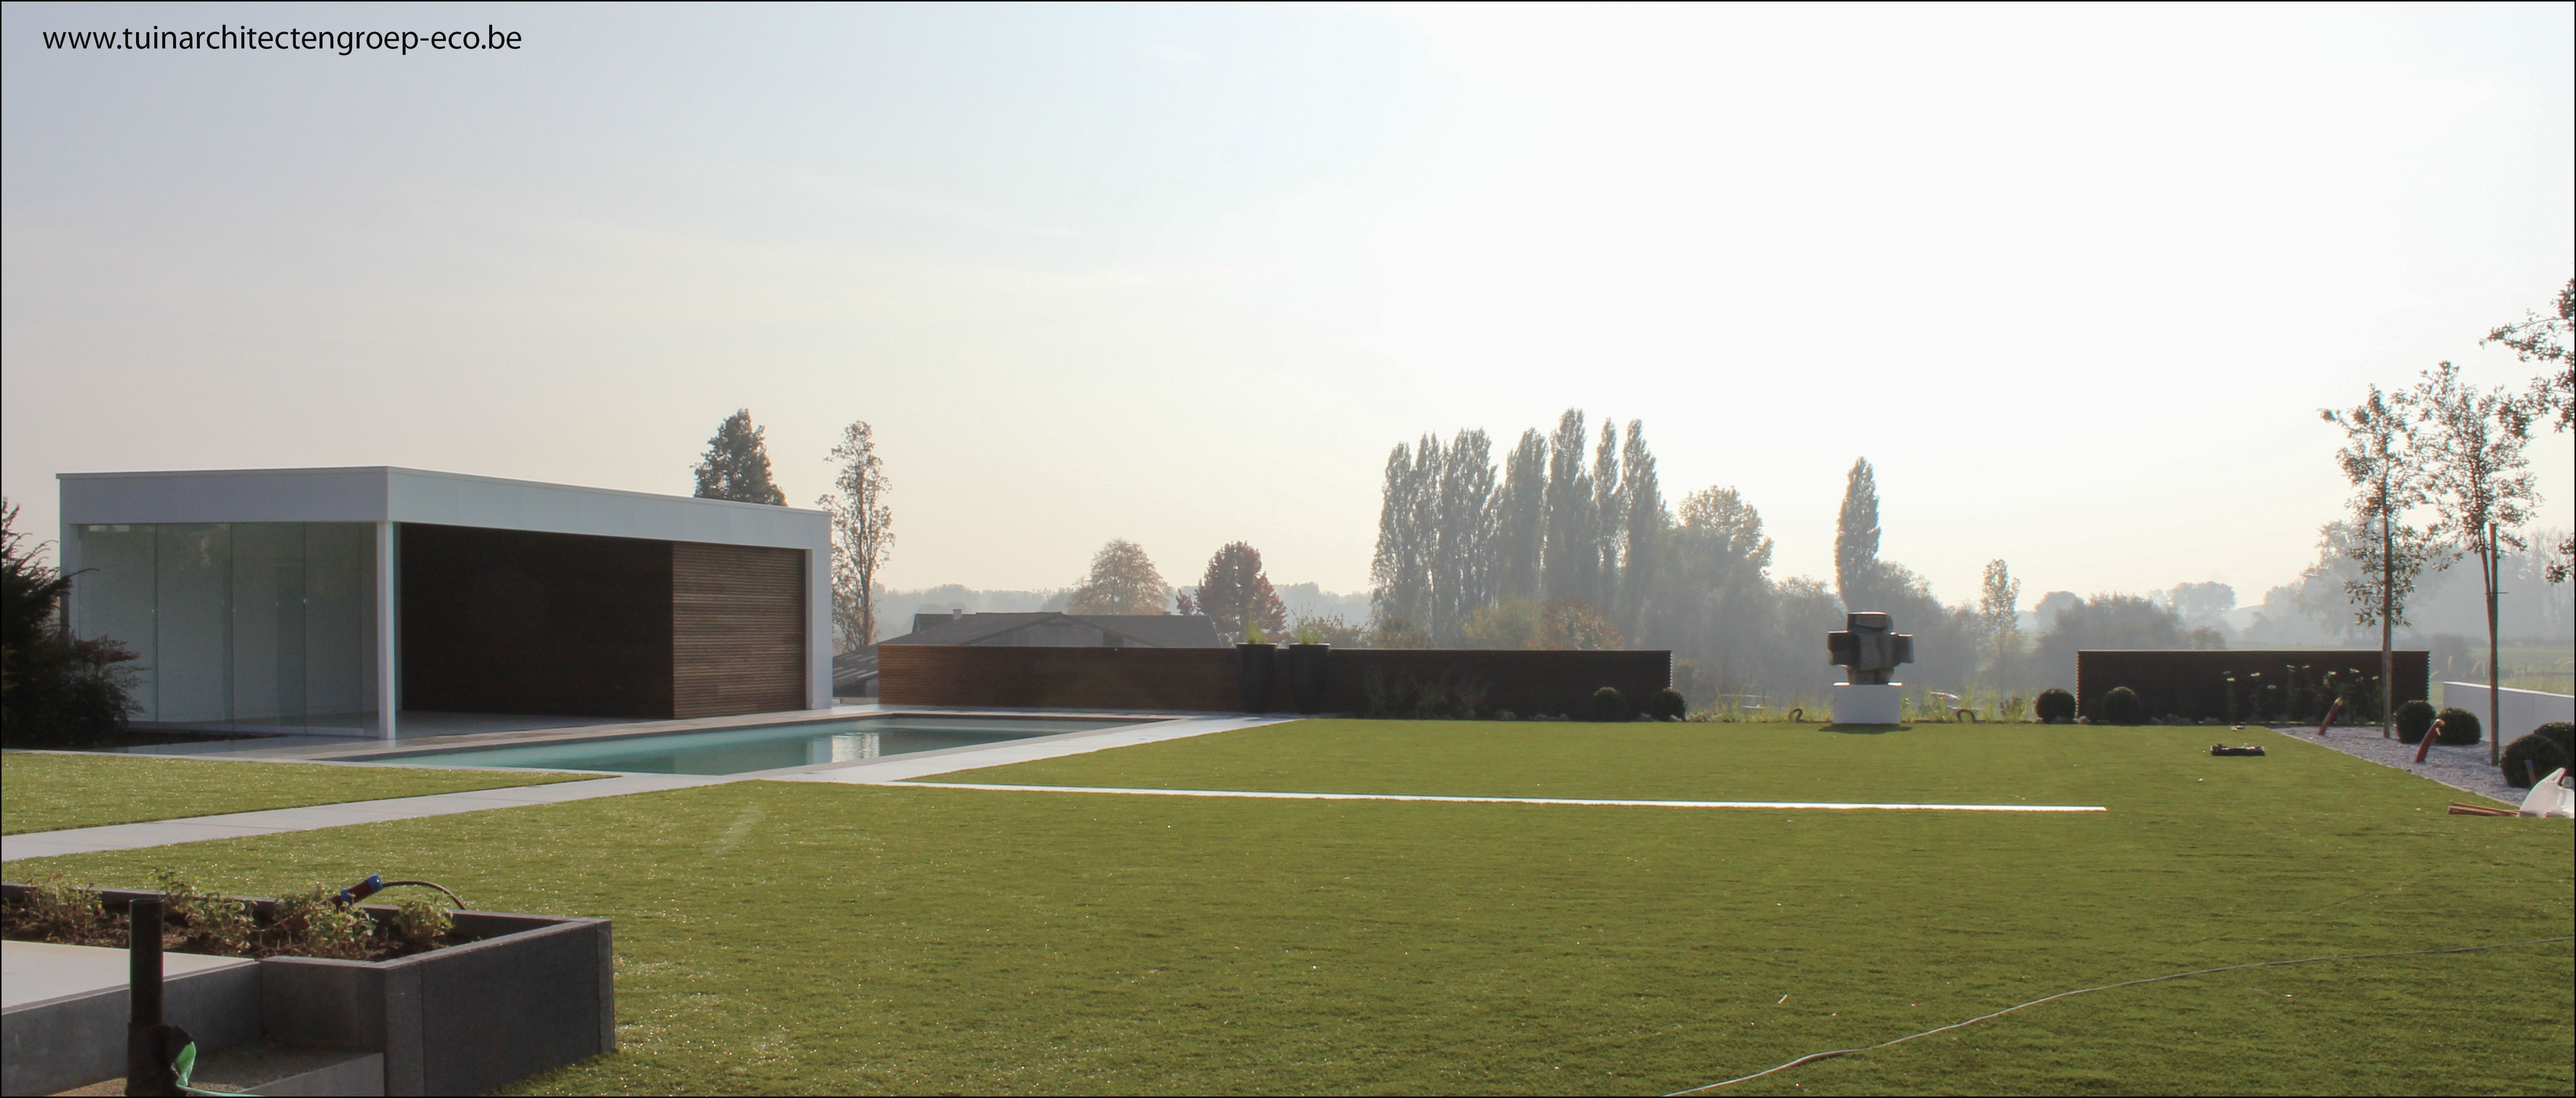 Moderne tuin met aluminium poolhouse zwembad met verdoken for Tuinarchitect modern